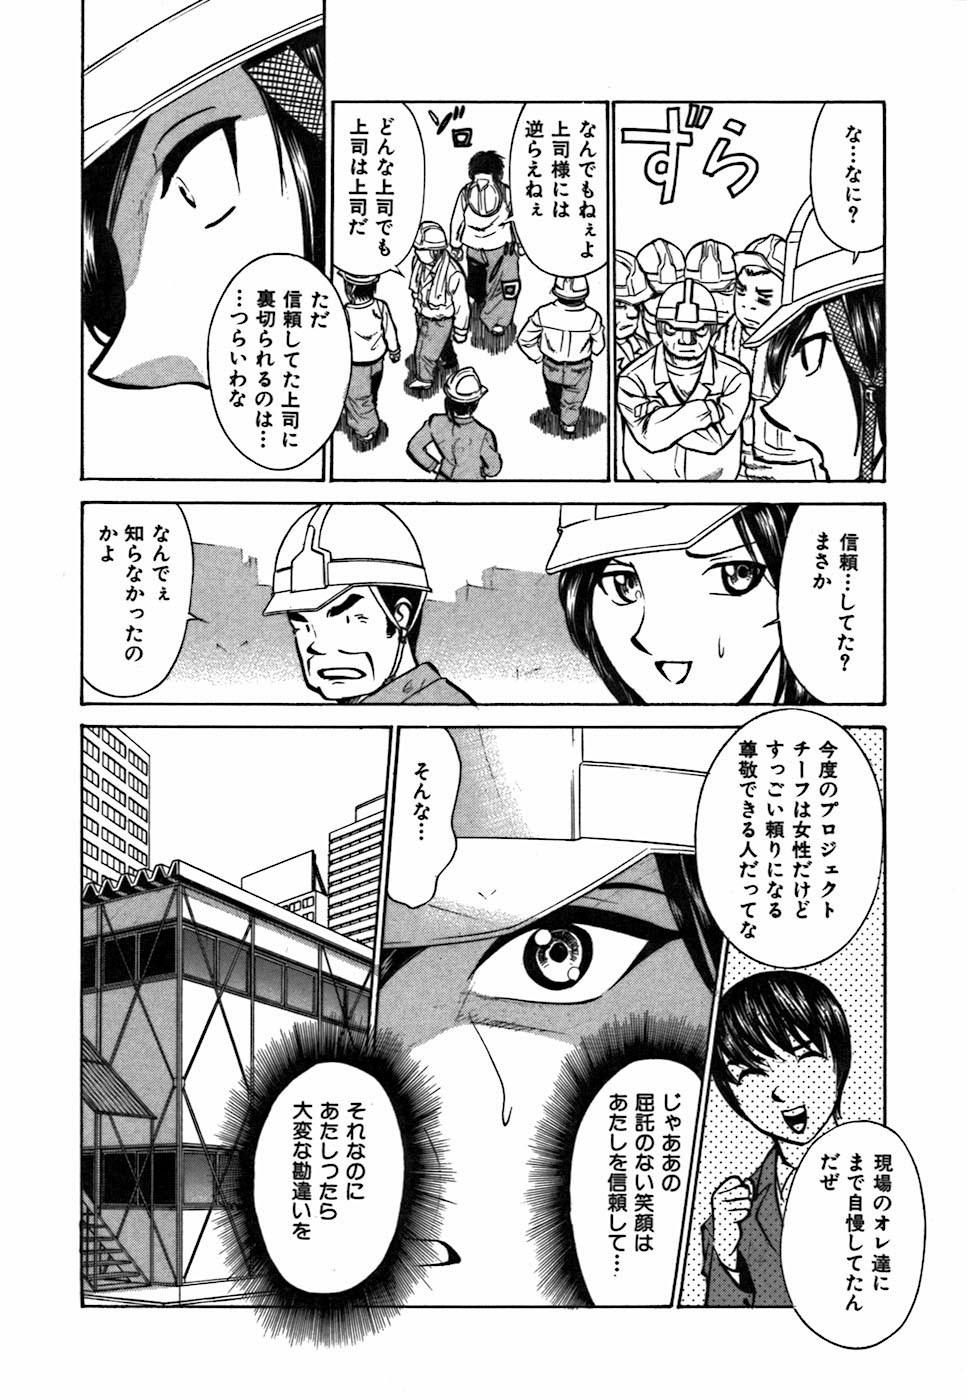 Kimi ga Nozomu Katachi | Appearance for which you hope 51